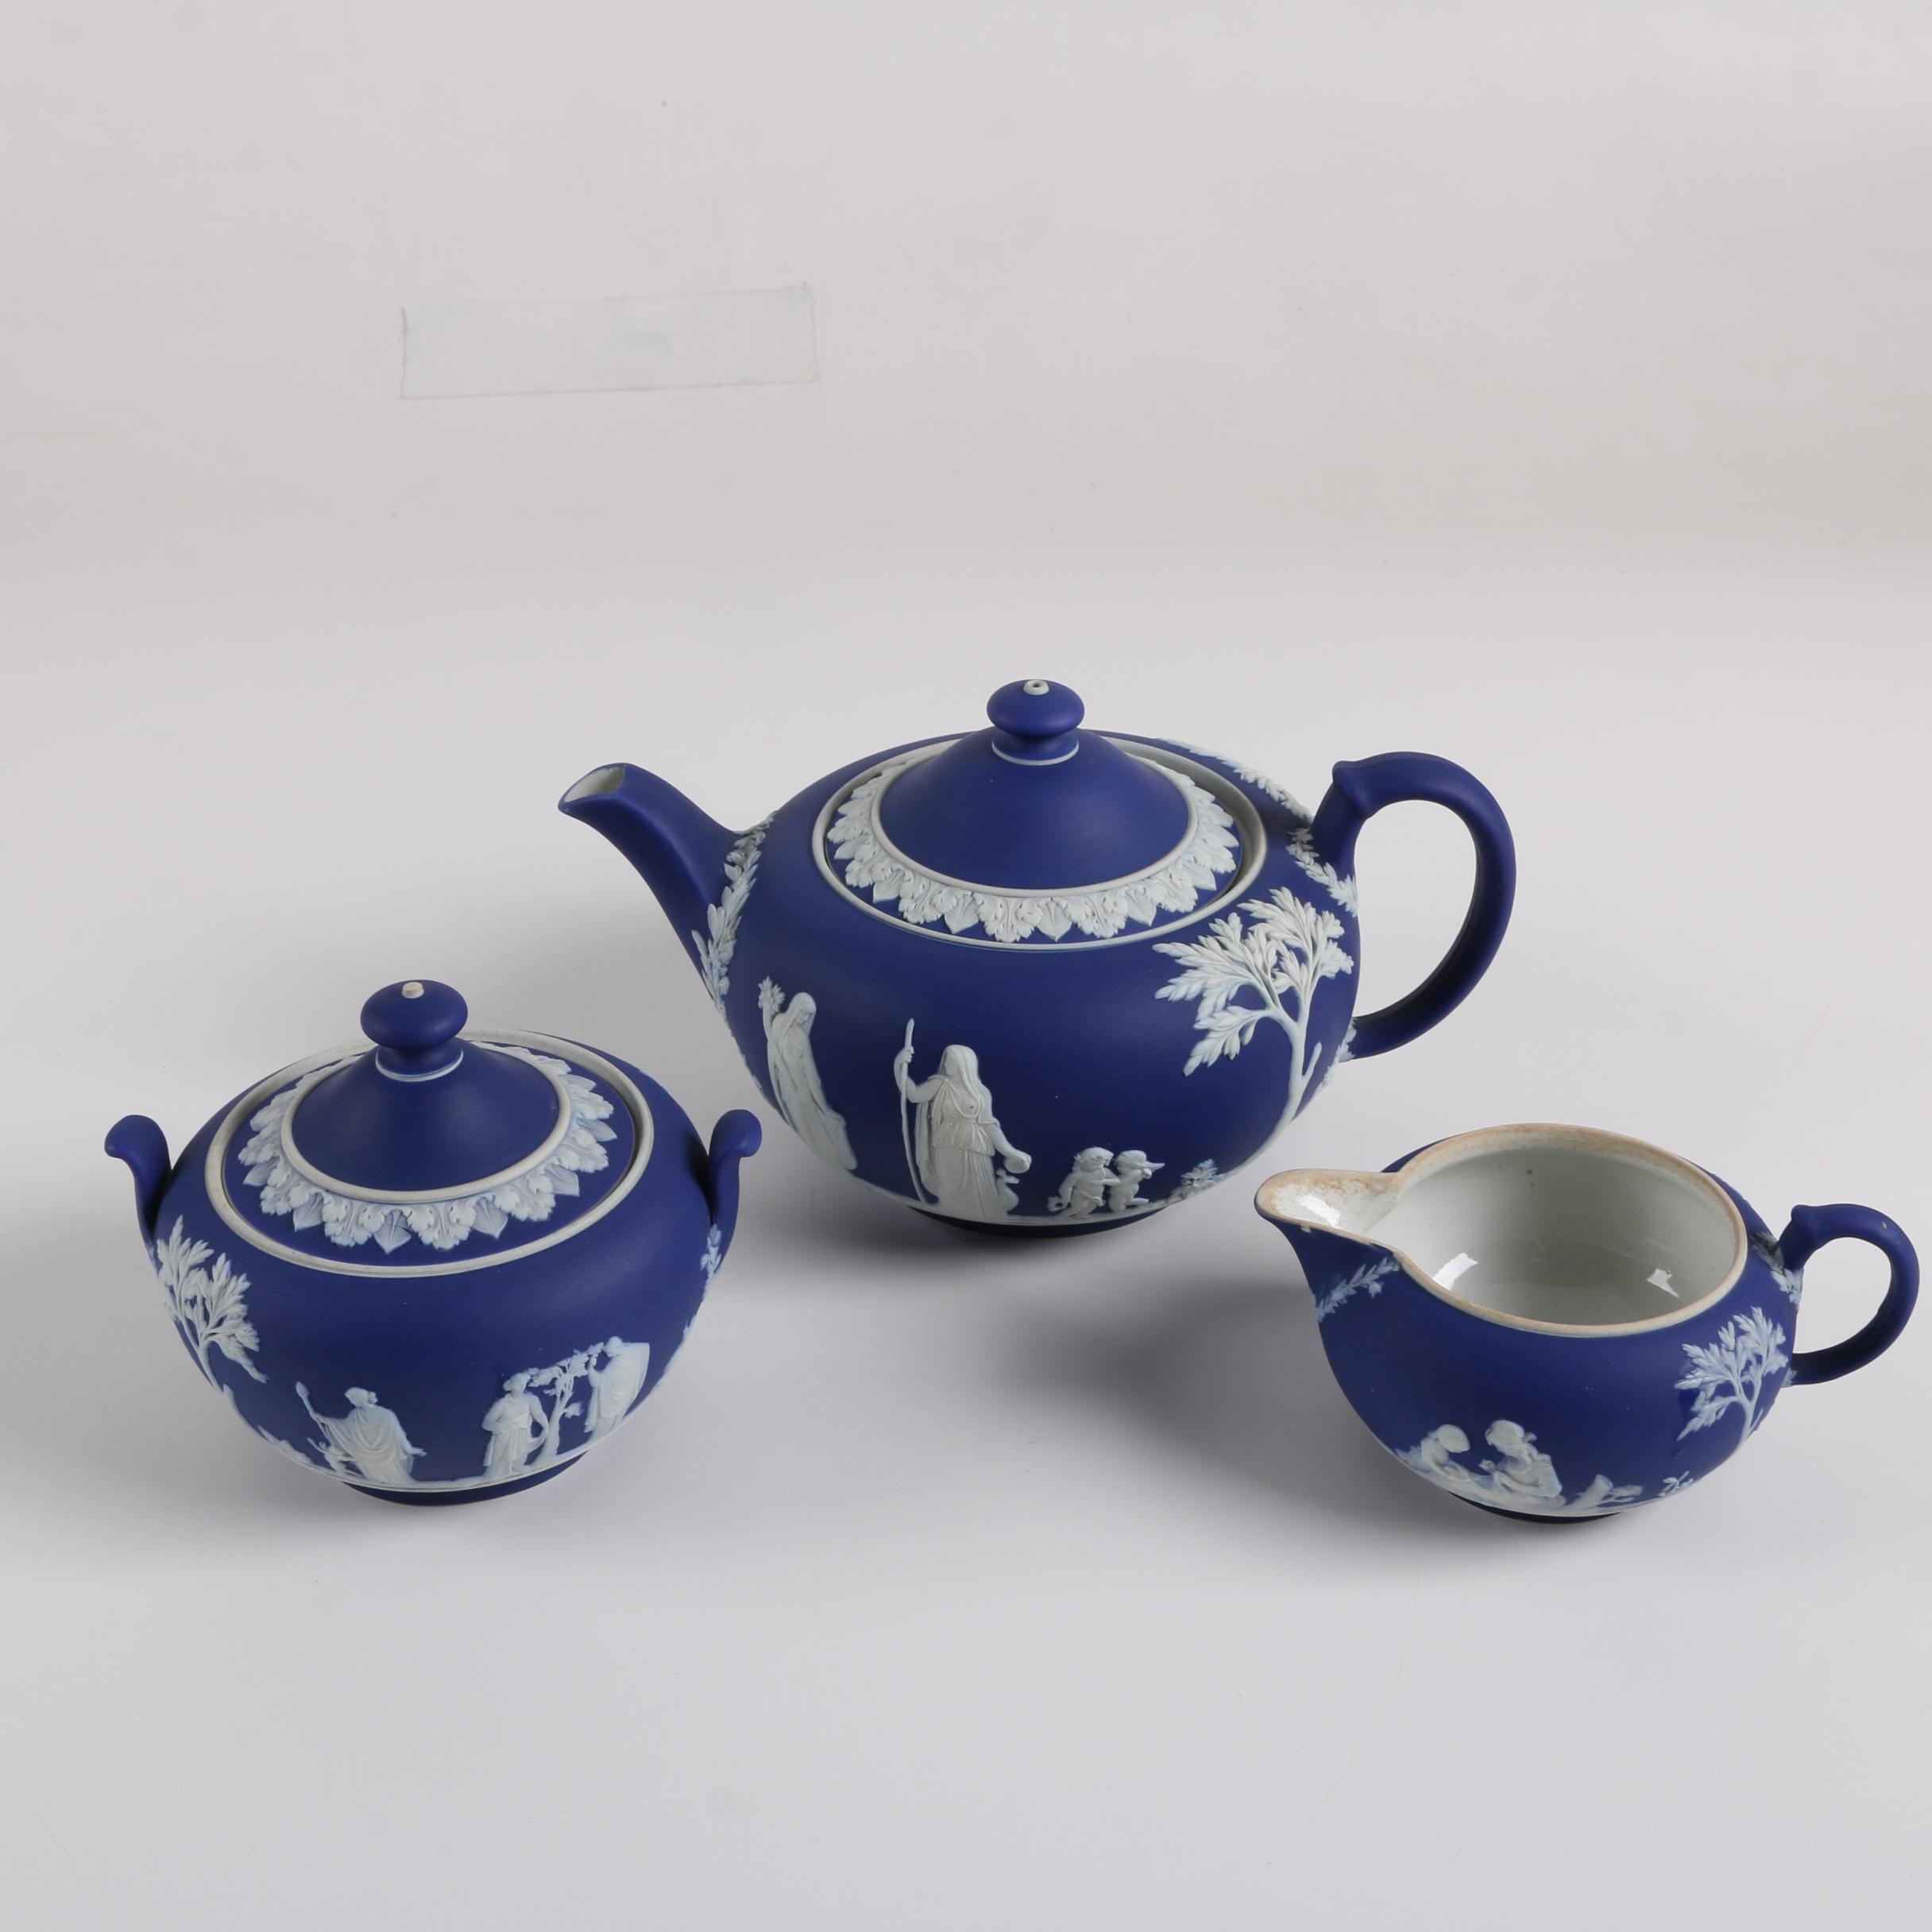 Vintage Wedgwood Cobalt Blue Jasperware Tea Serving Set